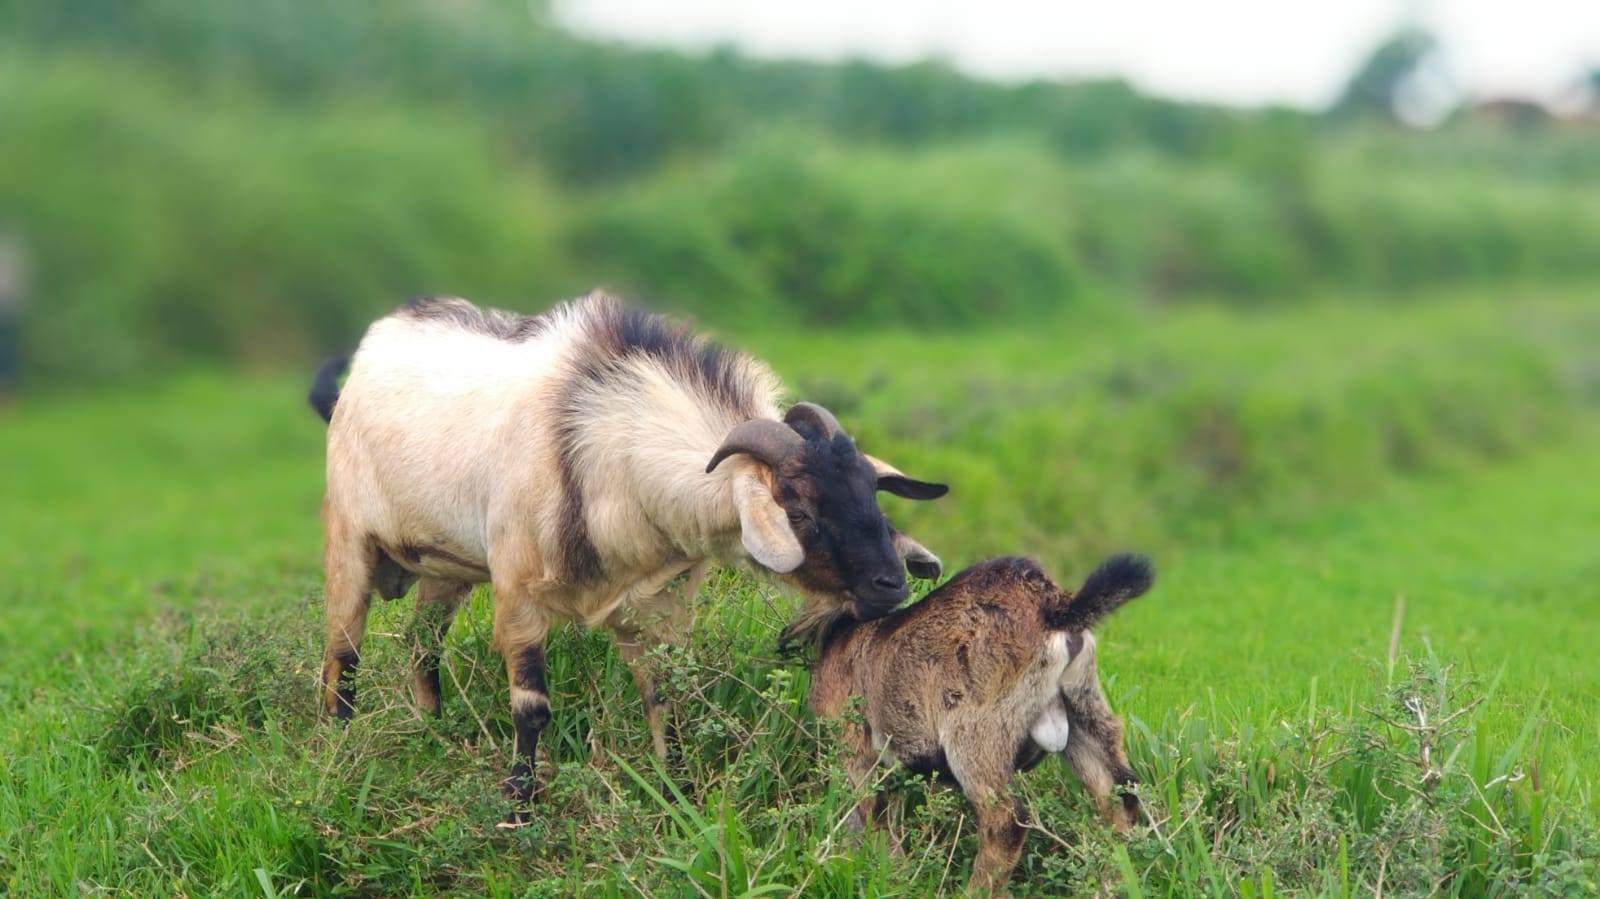 Penyakit yang Sering Menyerang Kambing dan Domba